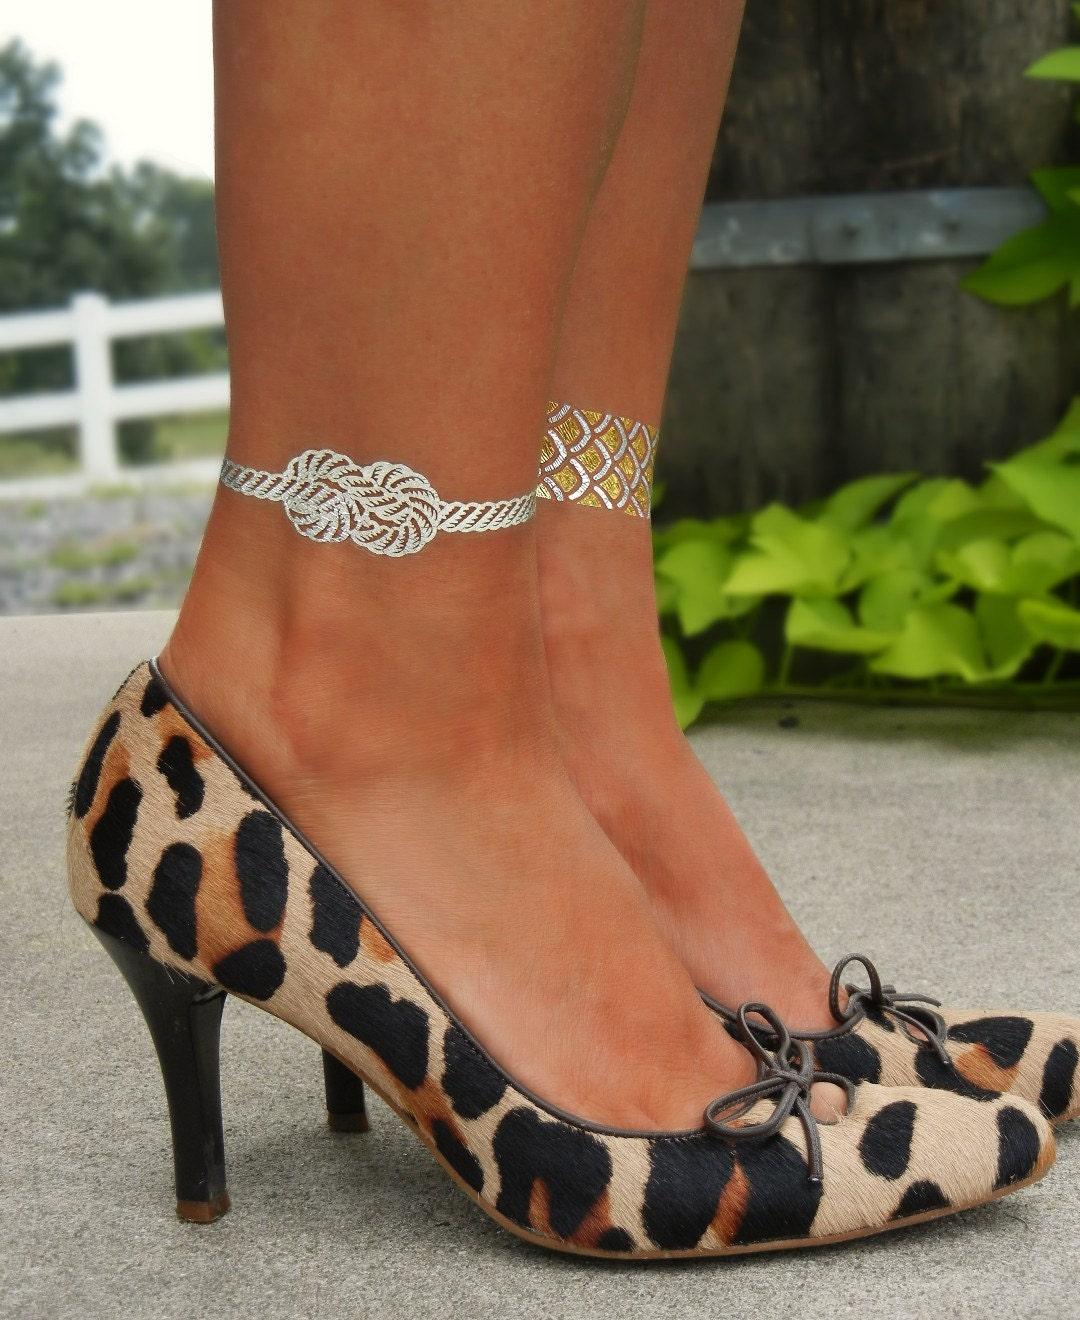 Charm Bracelet Tattoo Google Search: Trendy Jewelry Trendy Bracelets Trendy Rings Metallic